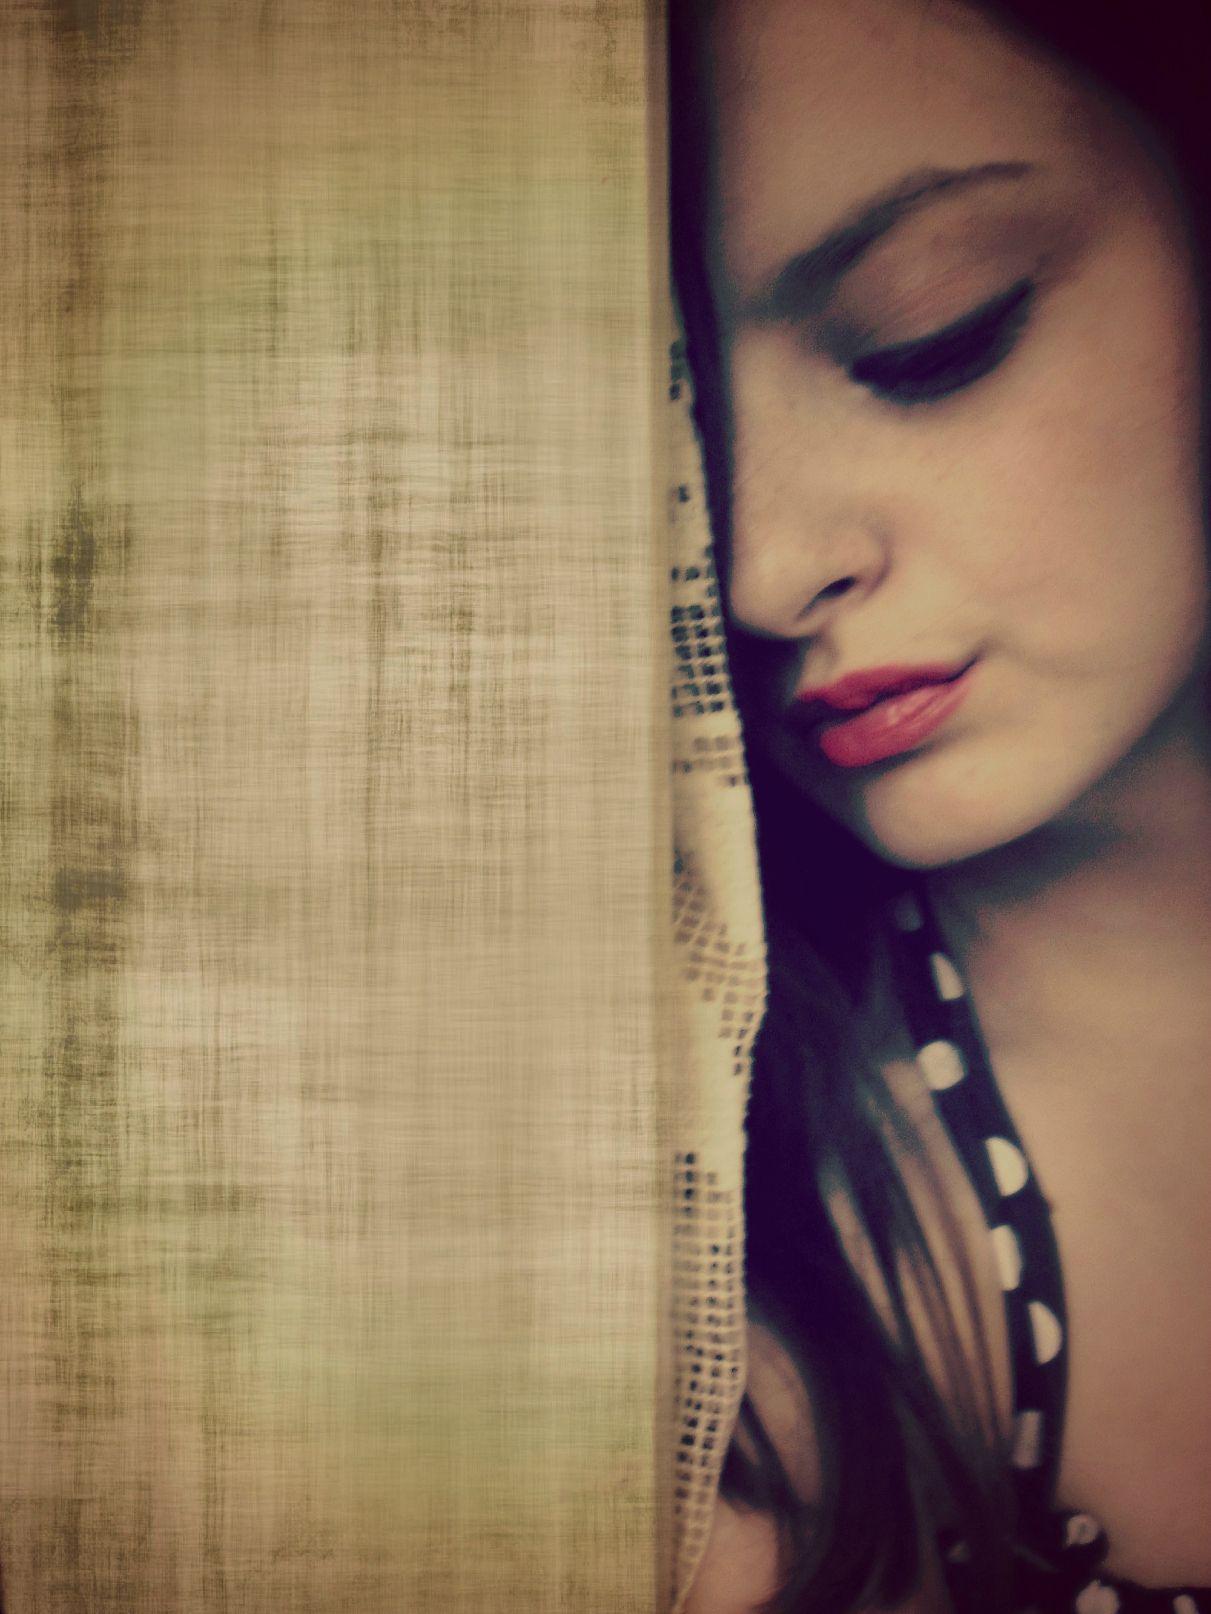 Girl alone sad red lipstick polka dots inspiring picture on favim com